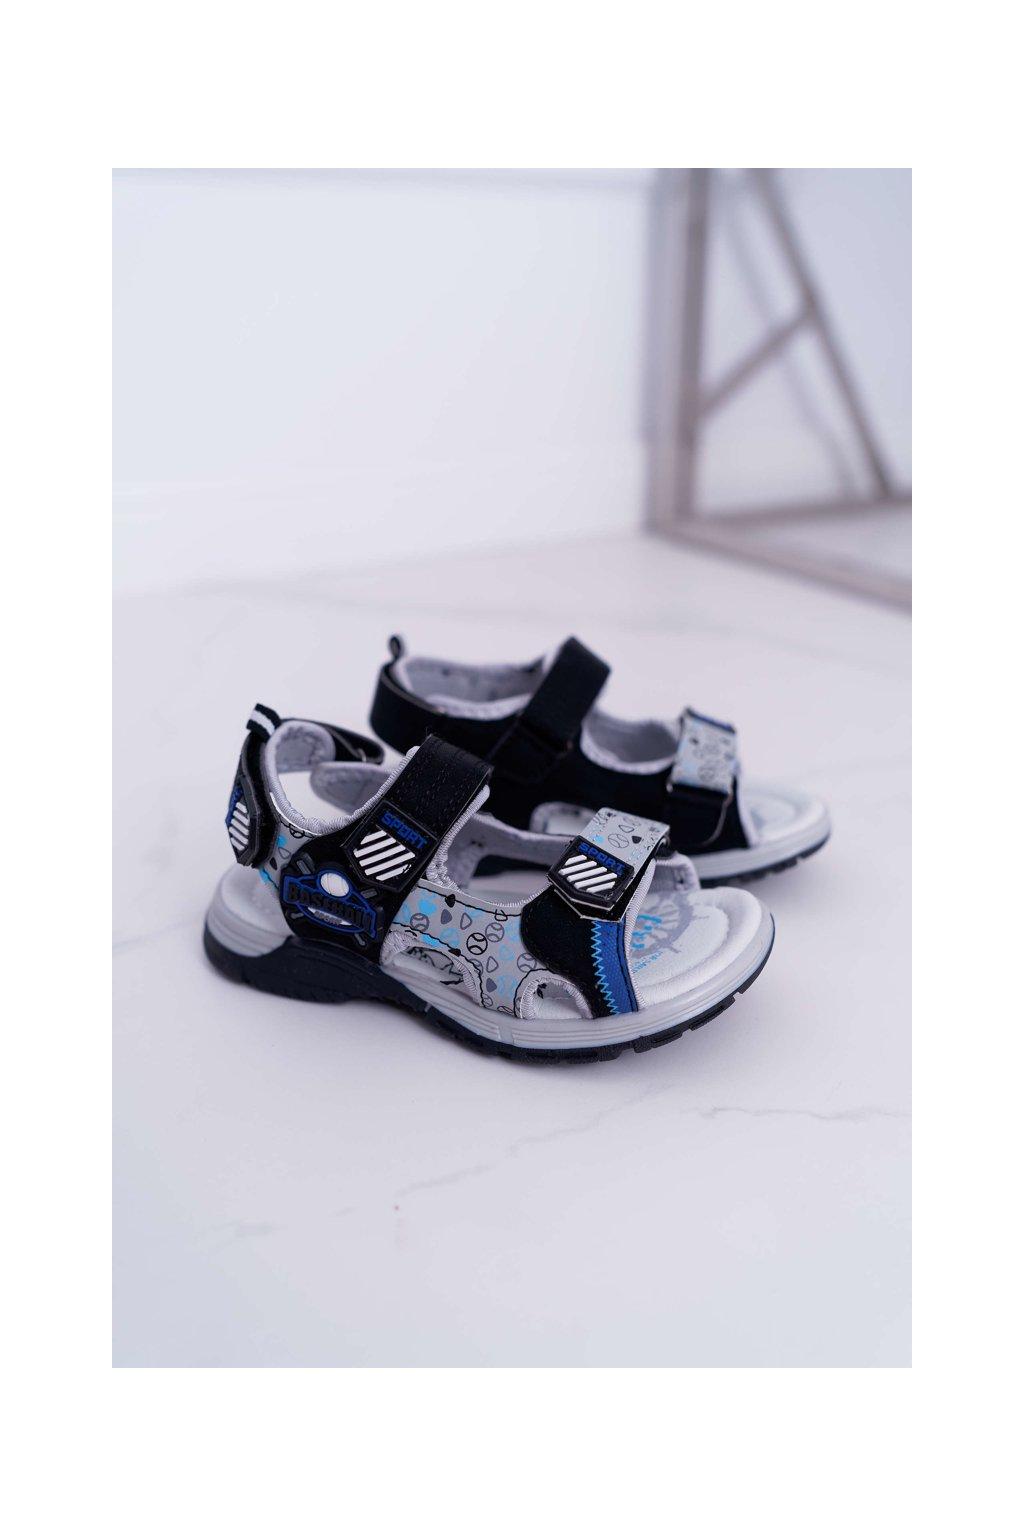 Detské chlapčenské Sandále na suchý zips čierne Reksio